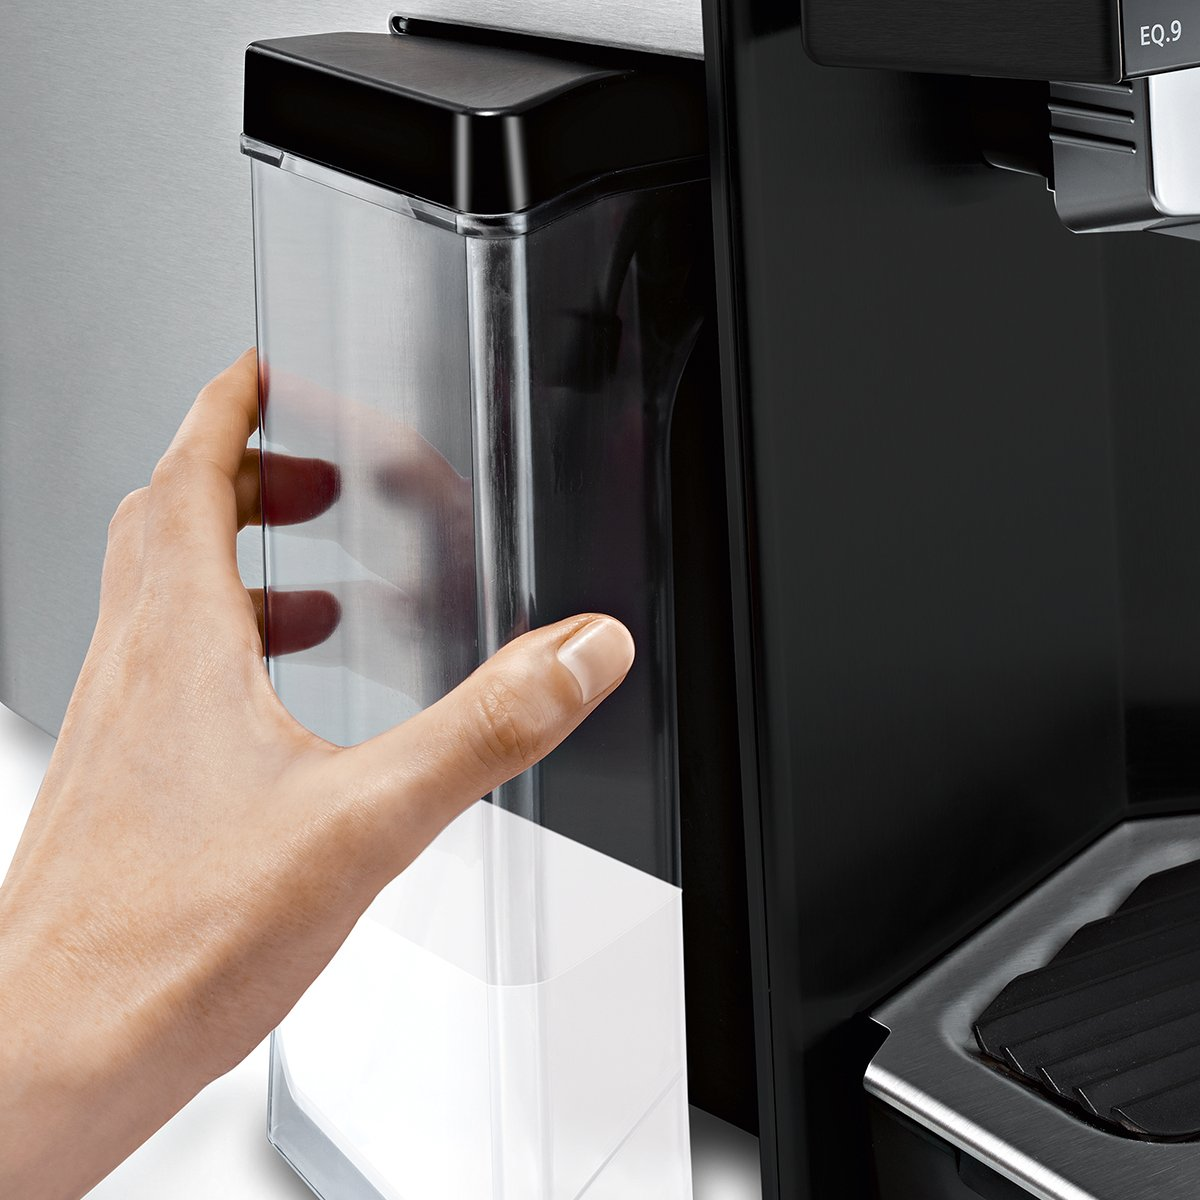 Siemens EQ.9 Independiente Máquina espresso Negro, Acero inoxidable 2,3 L 2 tazas Totalmente automática - Cafetera (Independiente, Máquina espresso, 2,3 L, ...